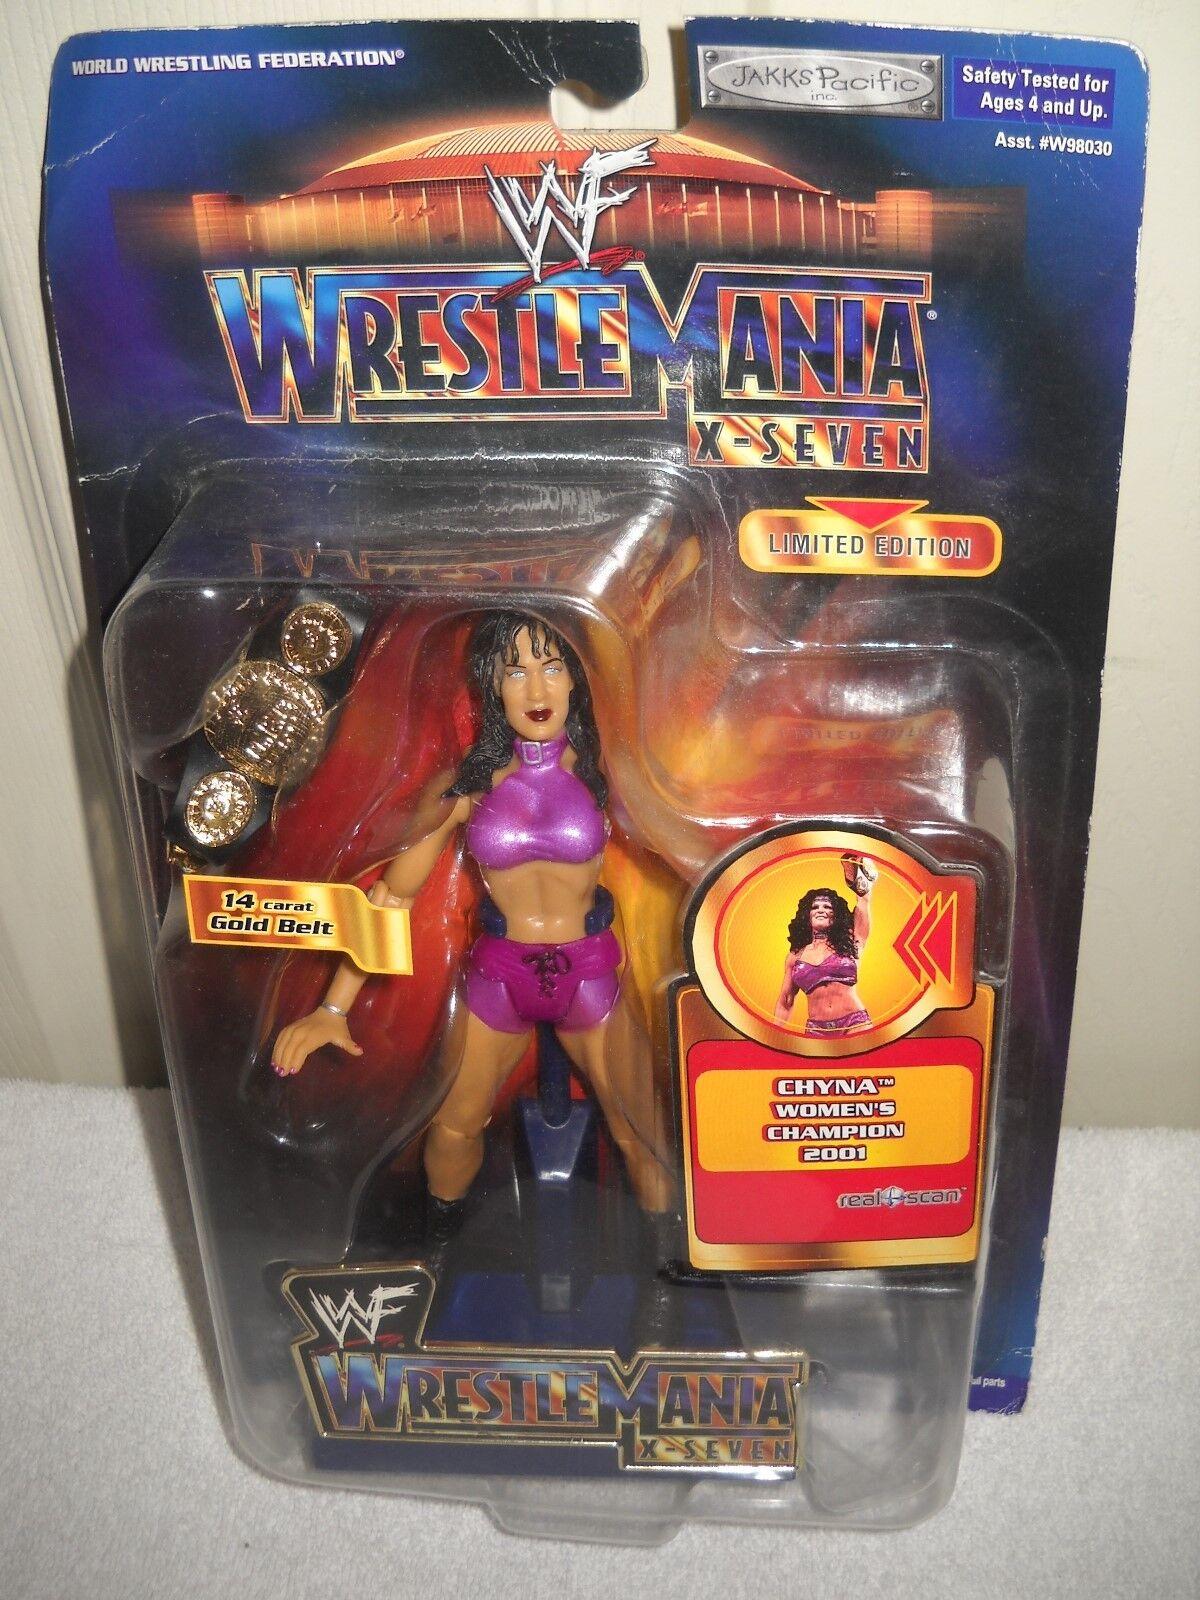 9253 noc jakks pazifik wf wrestlemania limited edition 2001 chyna action - figur